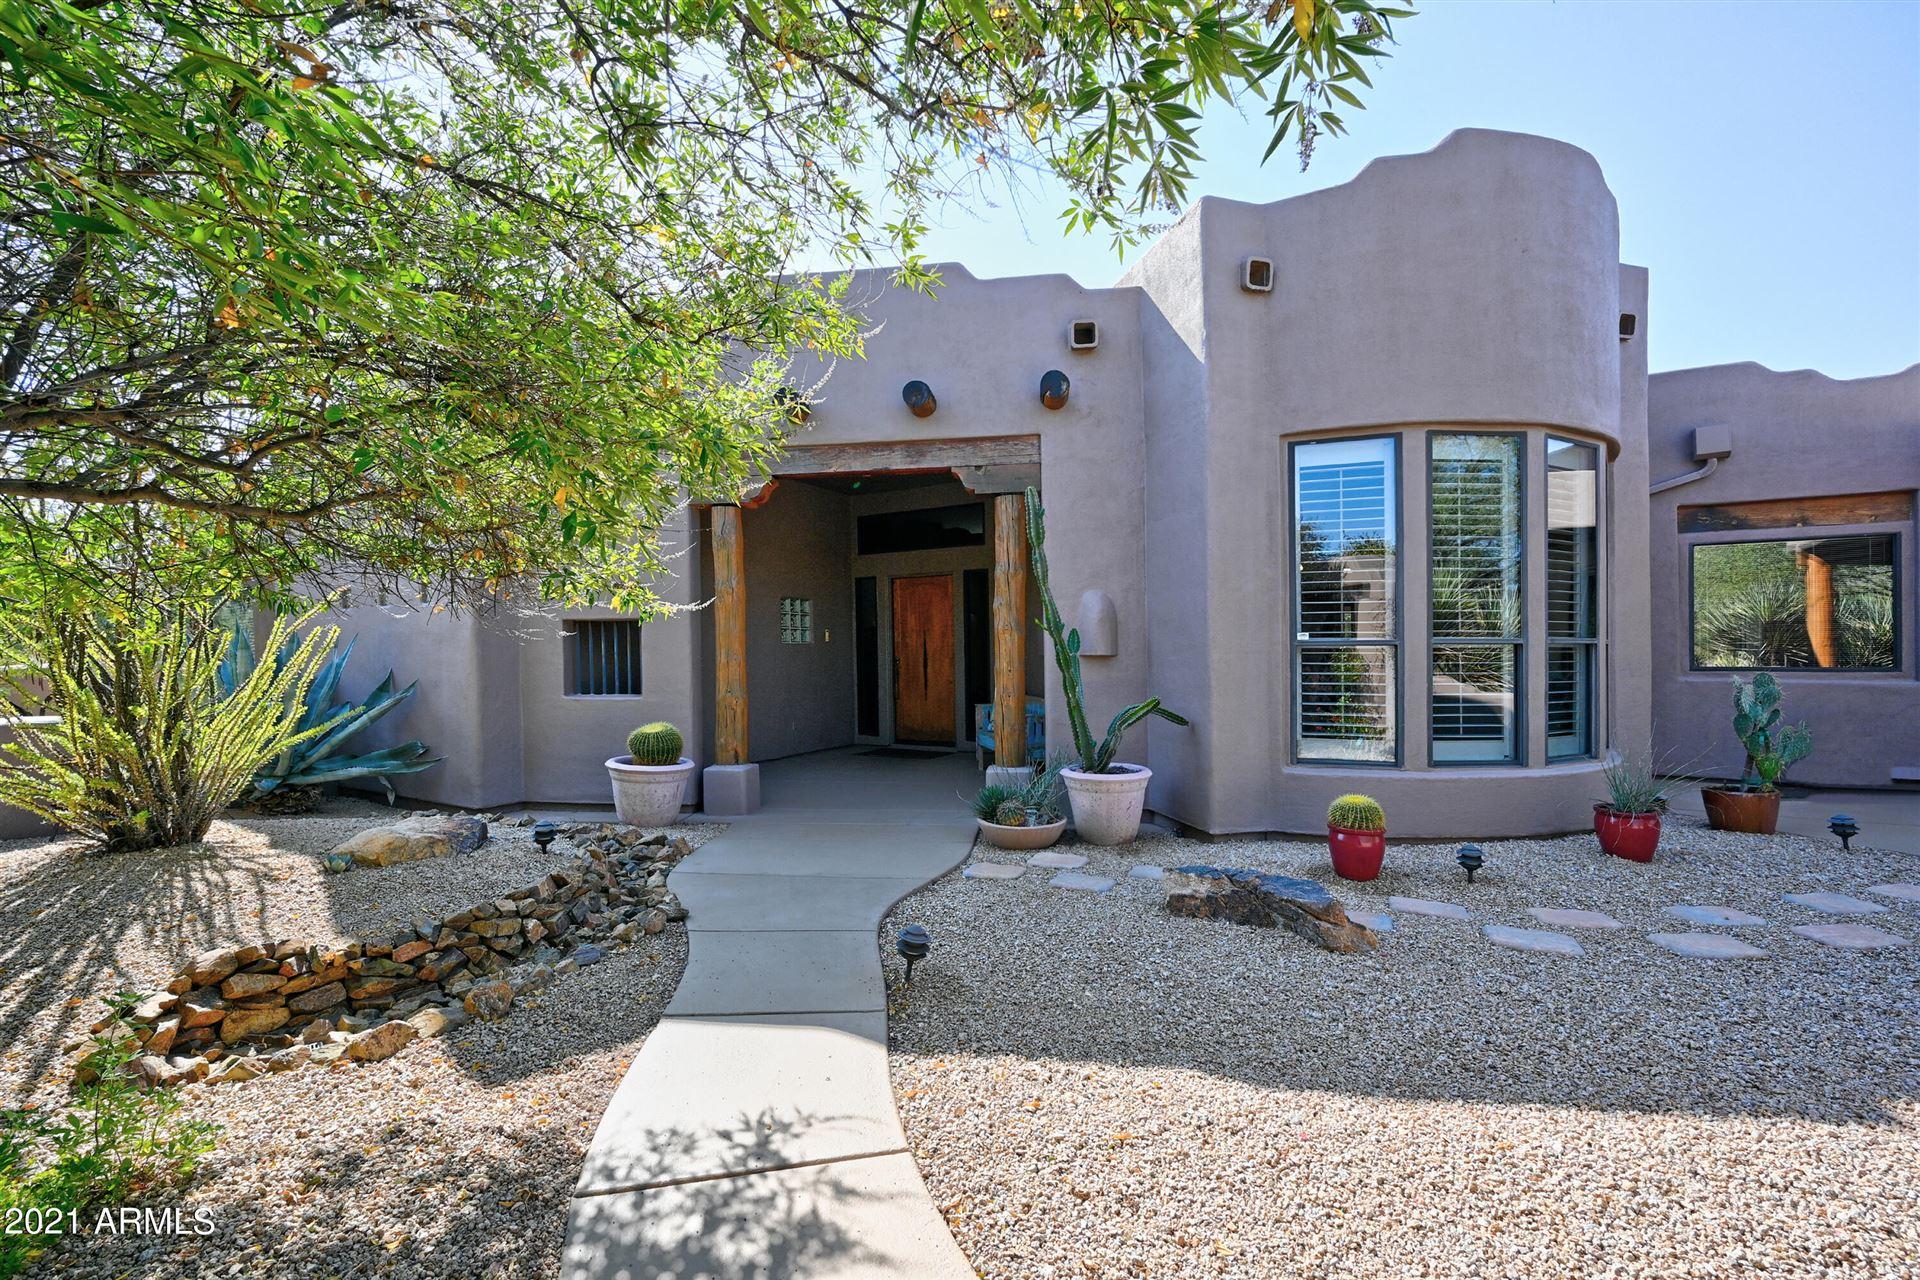 Photo of 5951 E LYSILOMA Place, Carefree, AZ 85377 (MLS # 6305832)